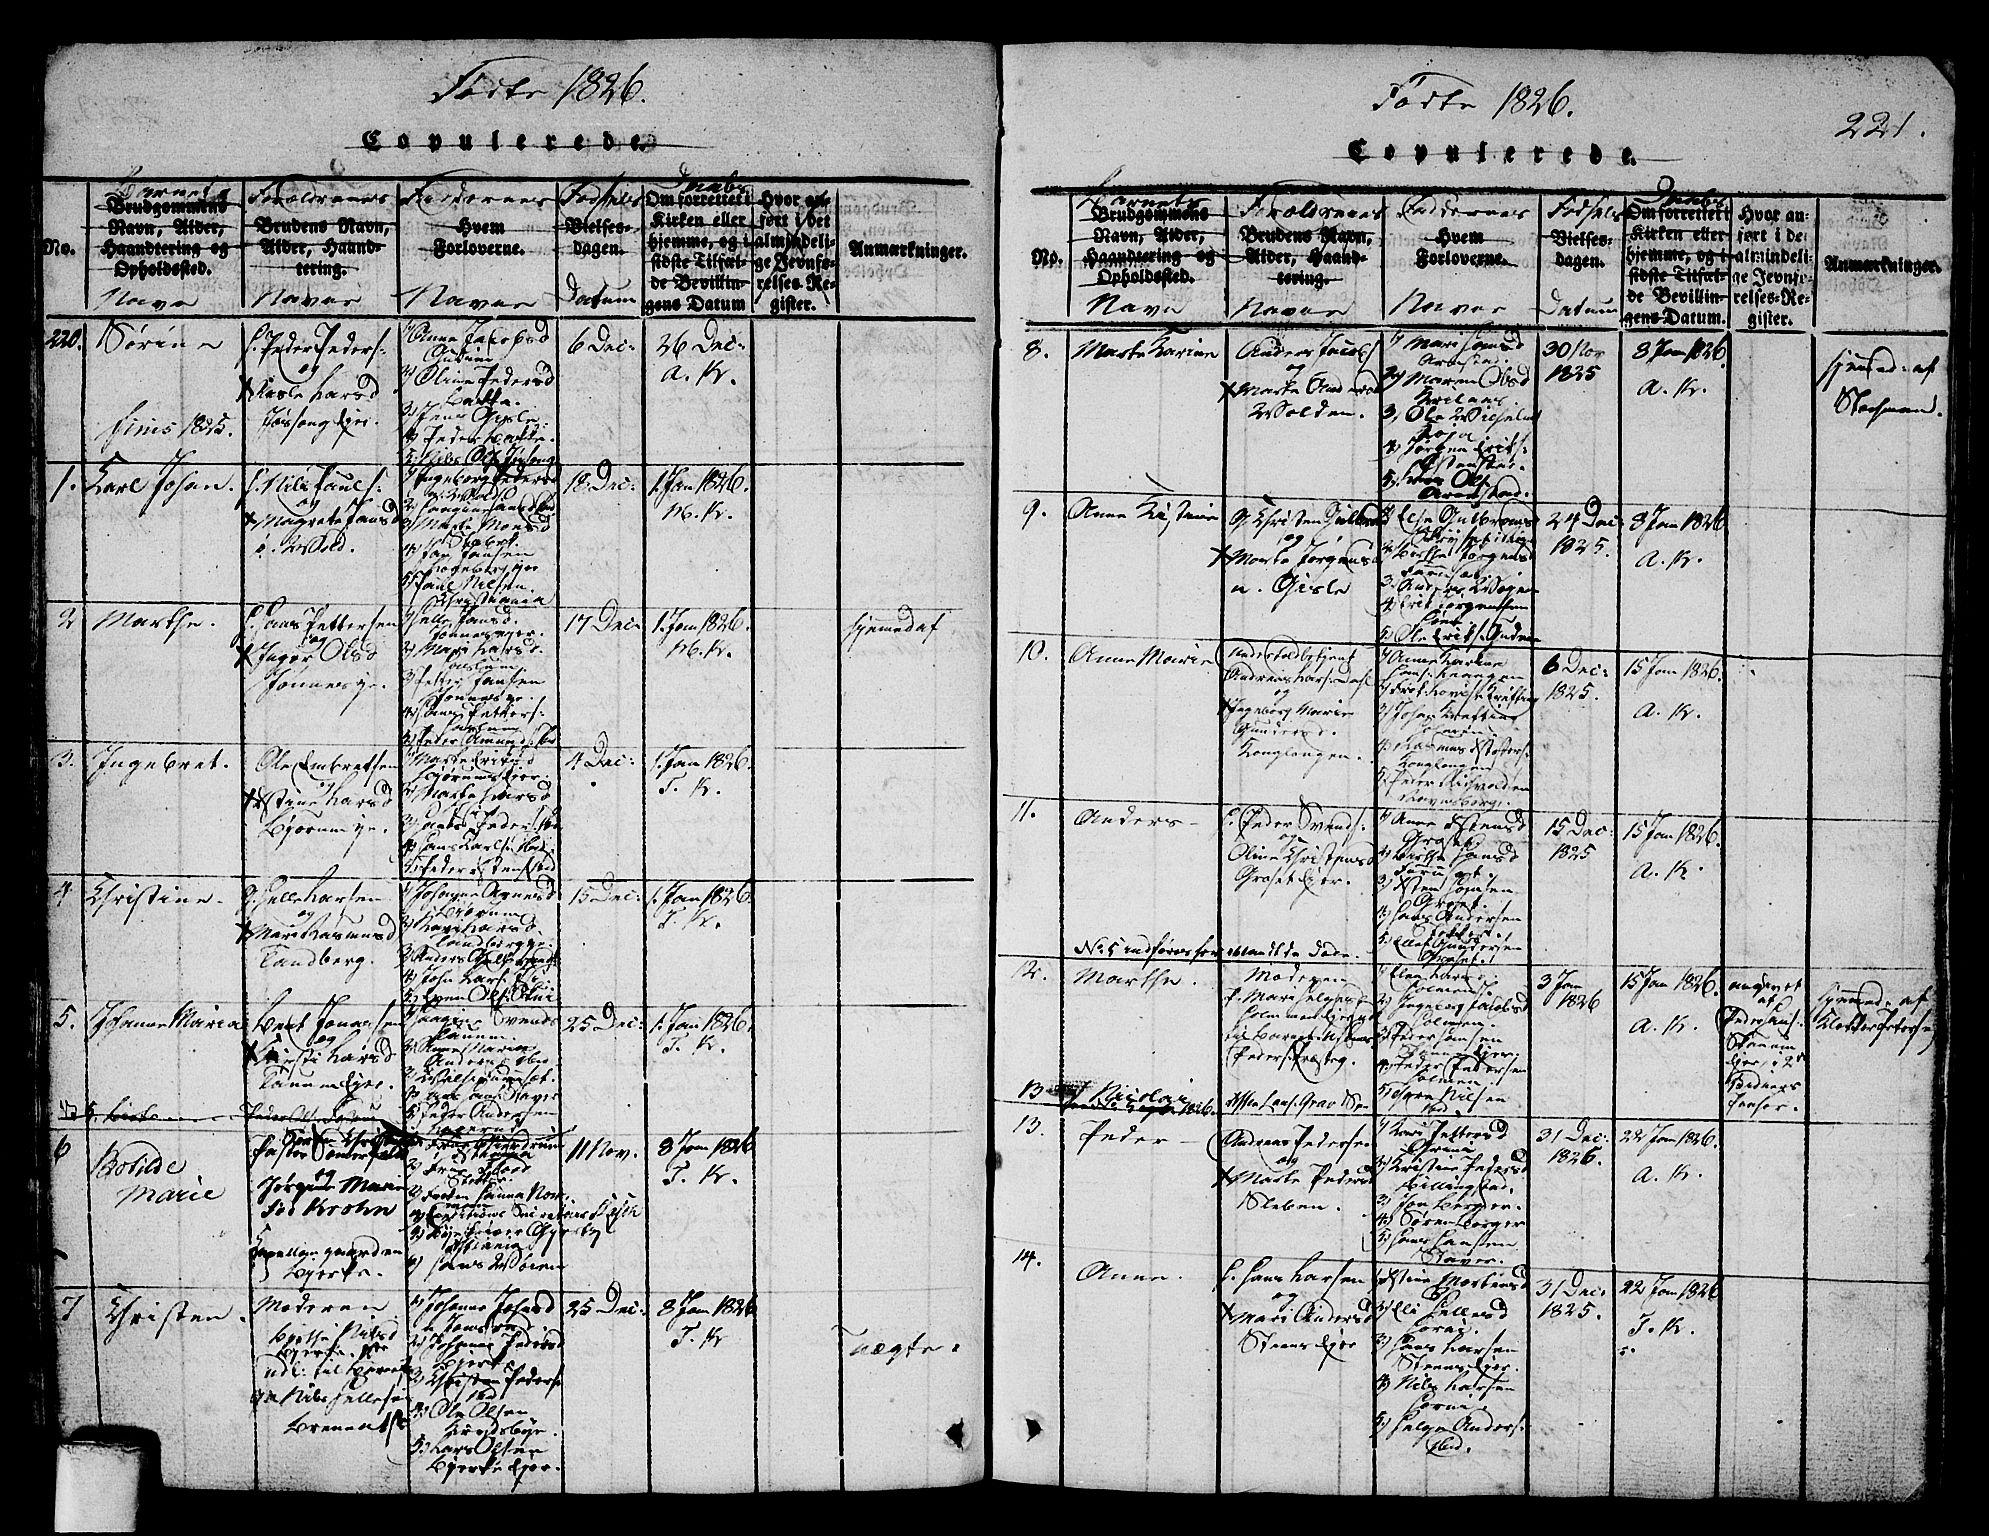 SAO, Asker prestekontor Kirkebøker, G/Ga/L0001: Klokkerbok nr. I 1, 1814-1830, s. 221